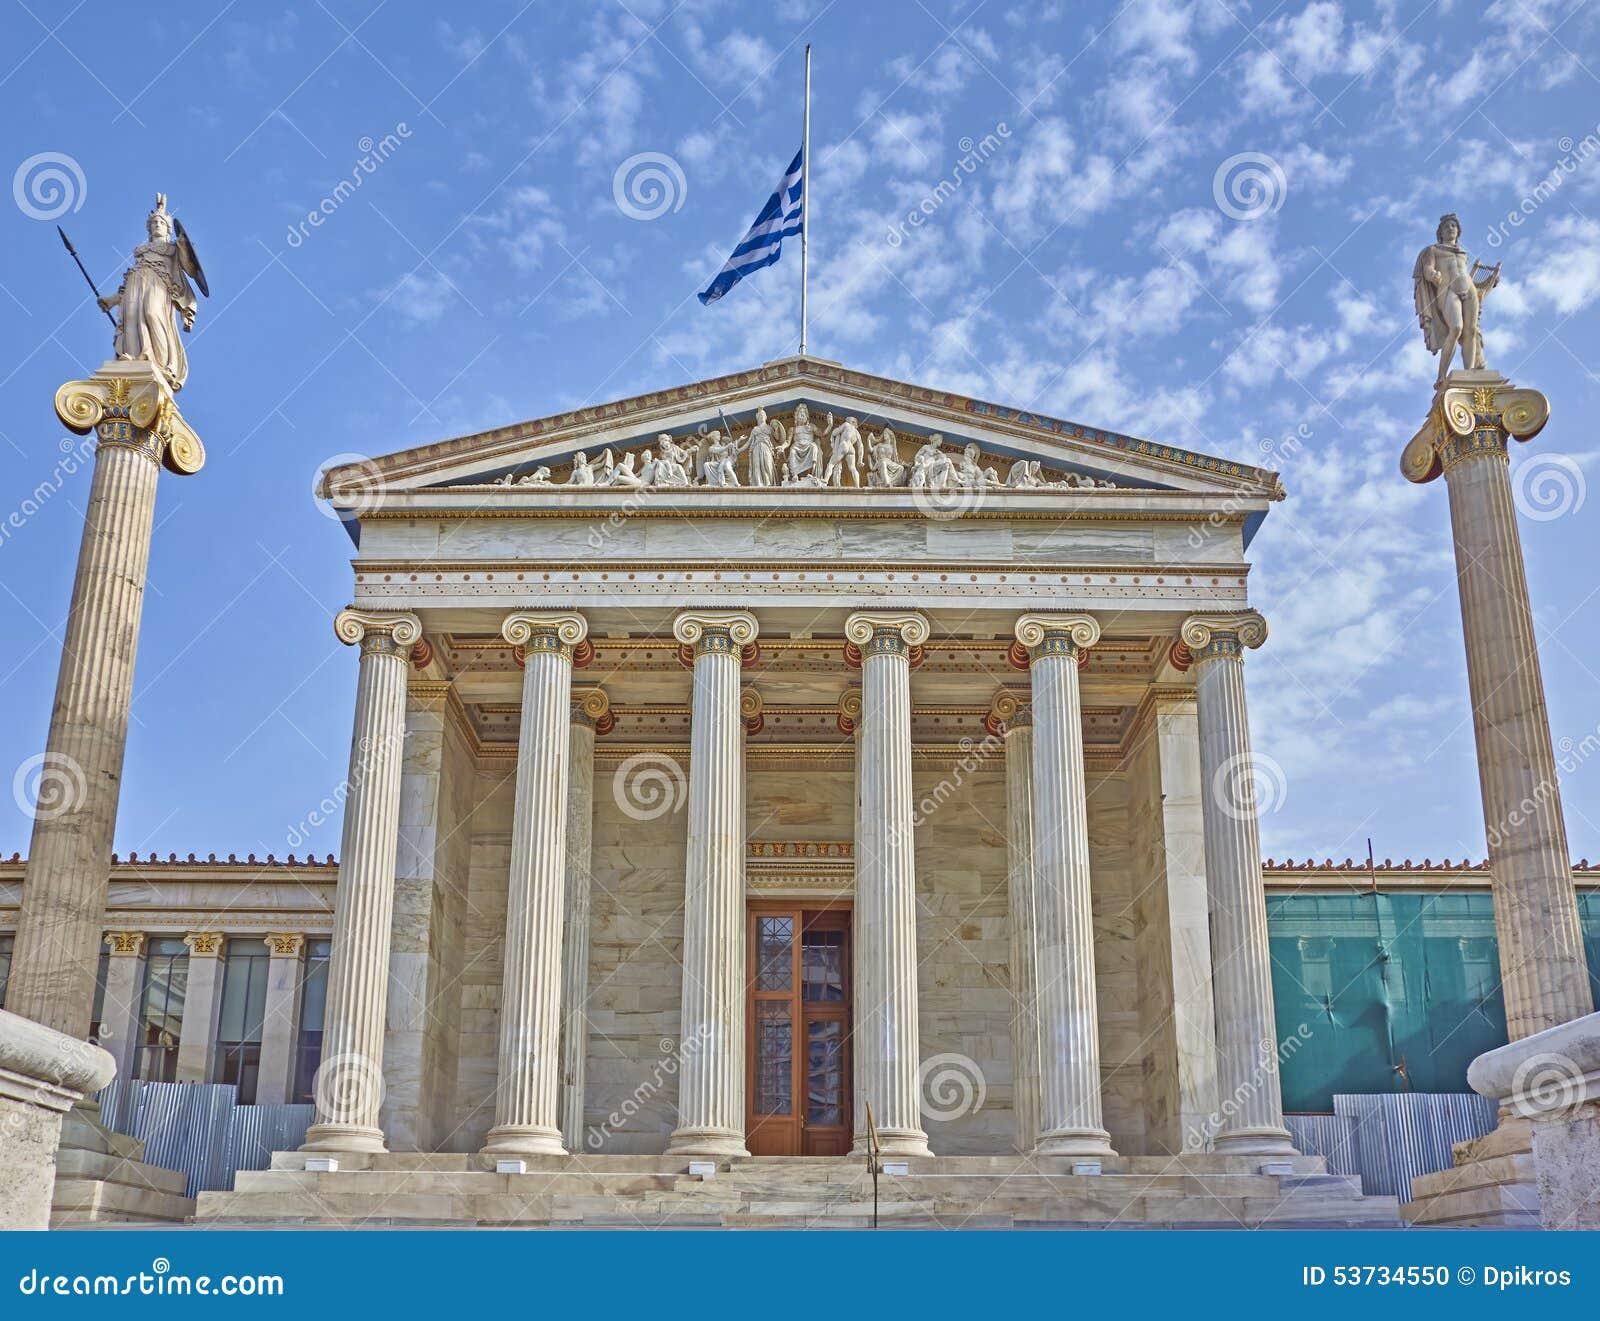 University Of Athens, Greece Stock Photo